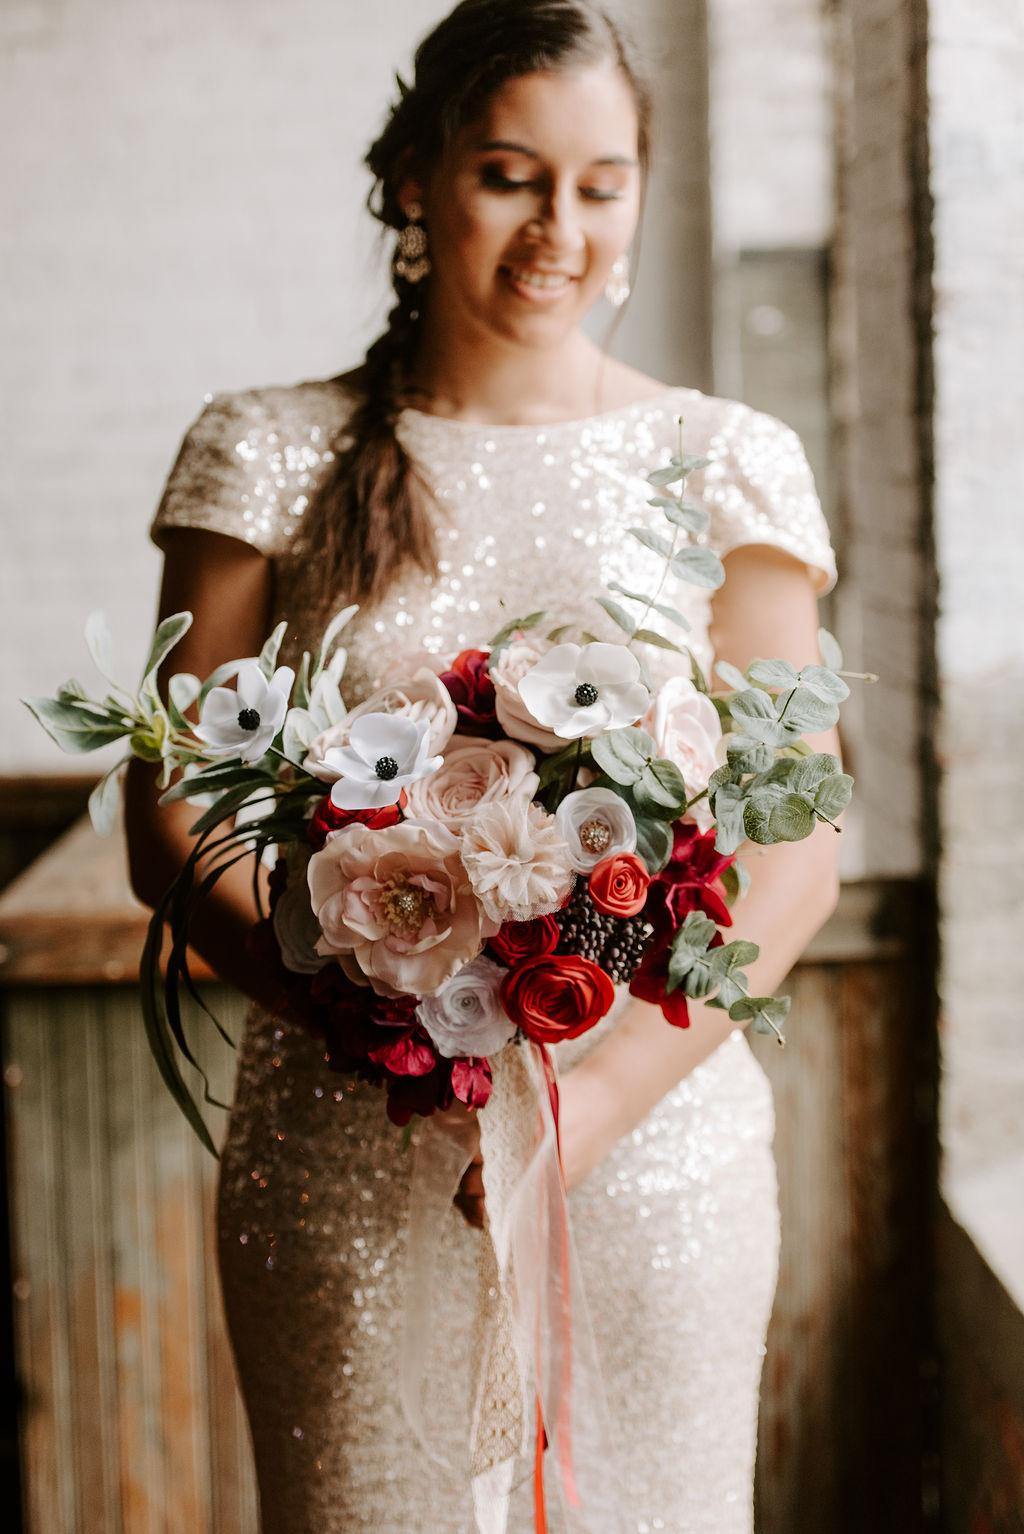 Non-traditional keepsake bouquet